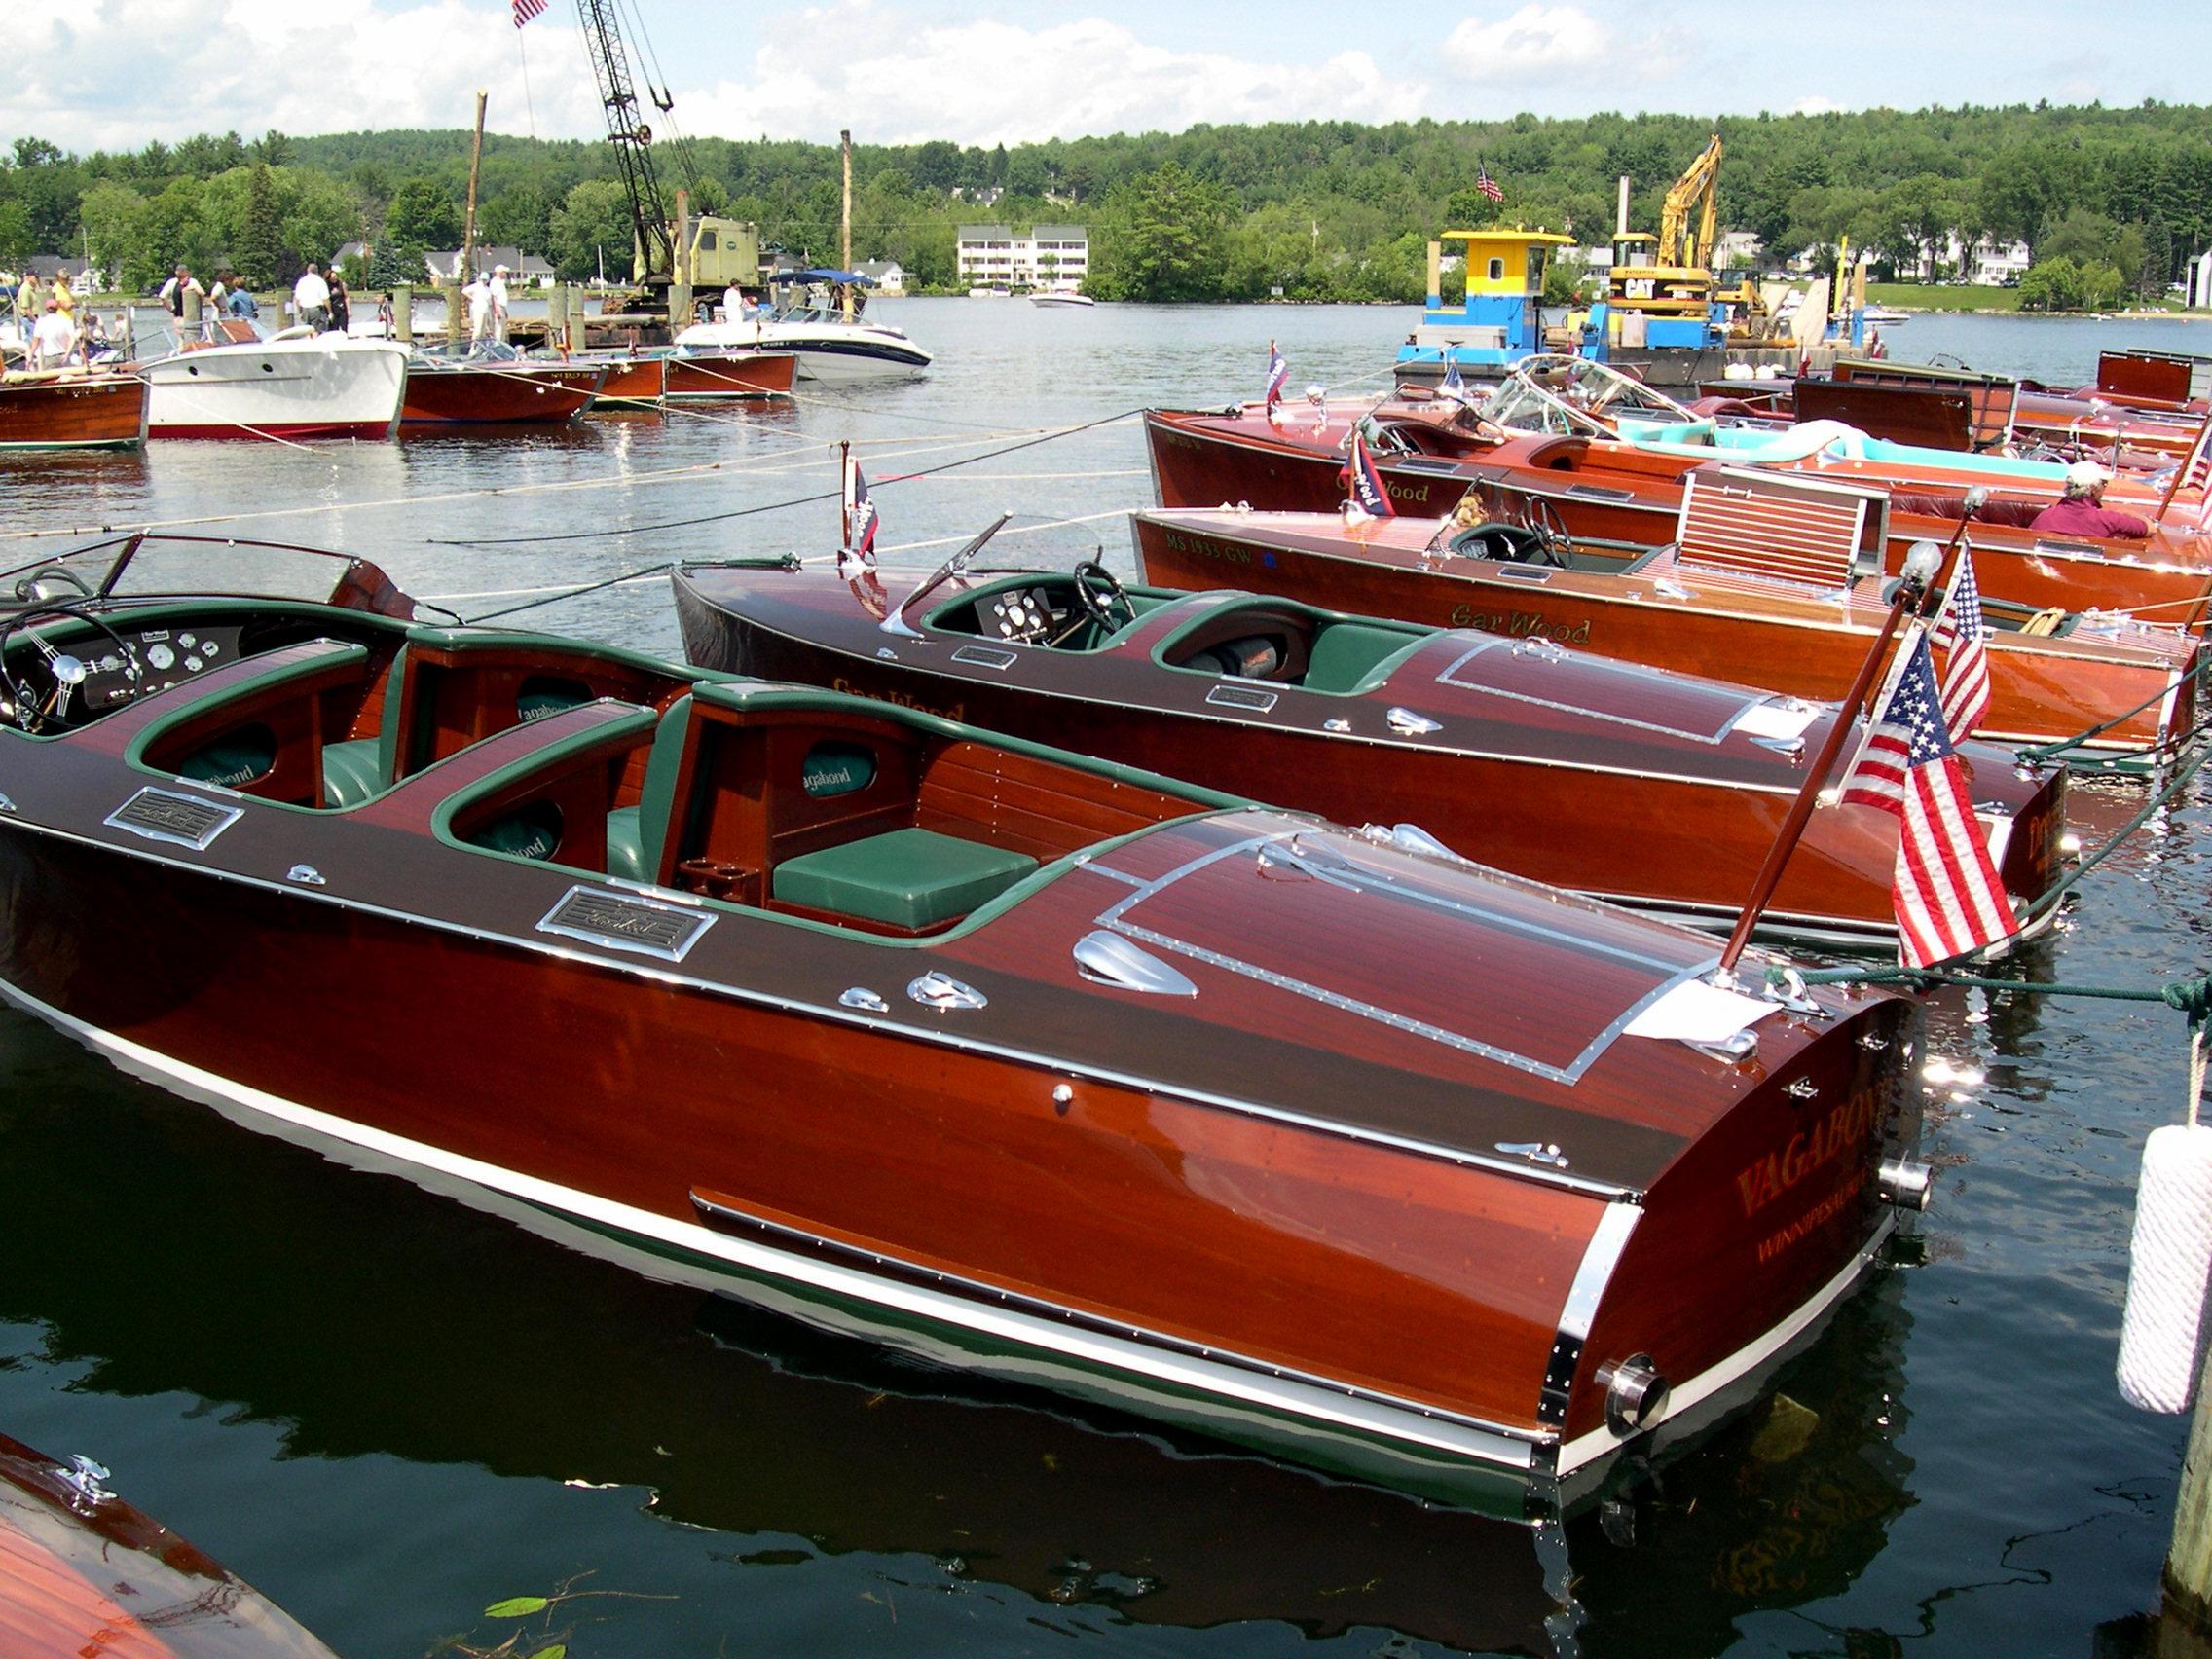 Meredith NH, Boat Show